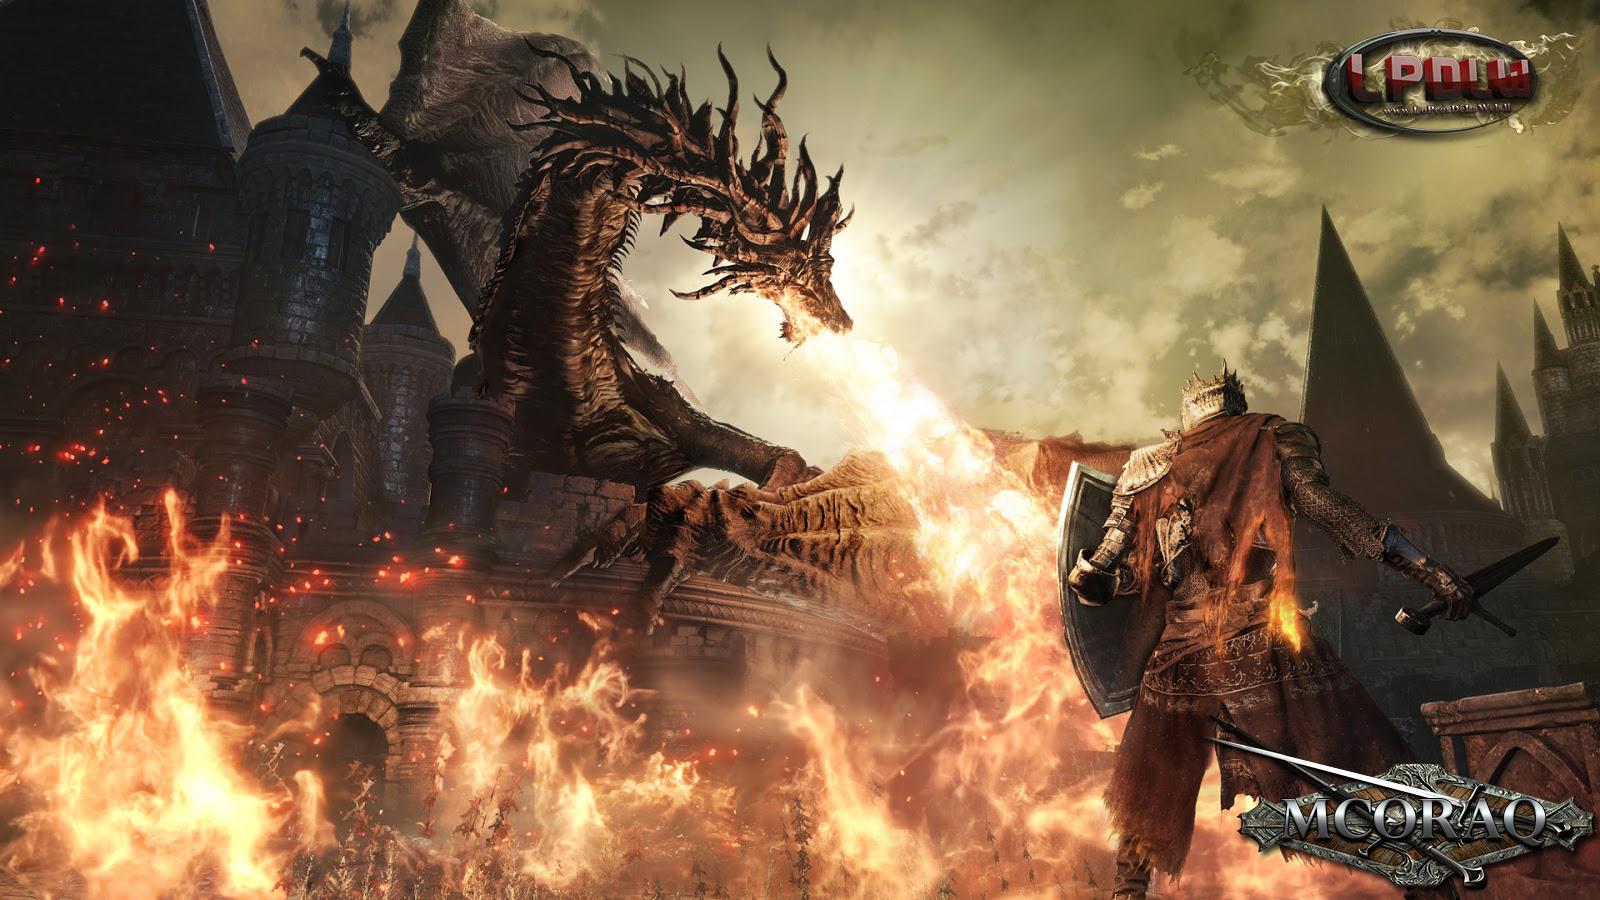 Dark Souls III Multilenguaje (Español) (PC-GAME)